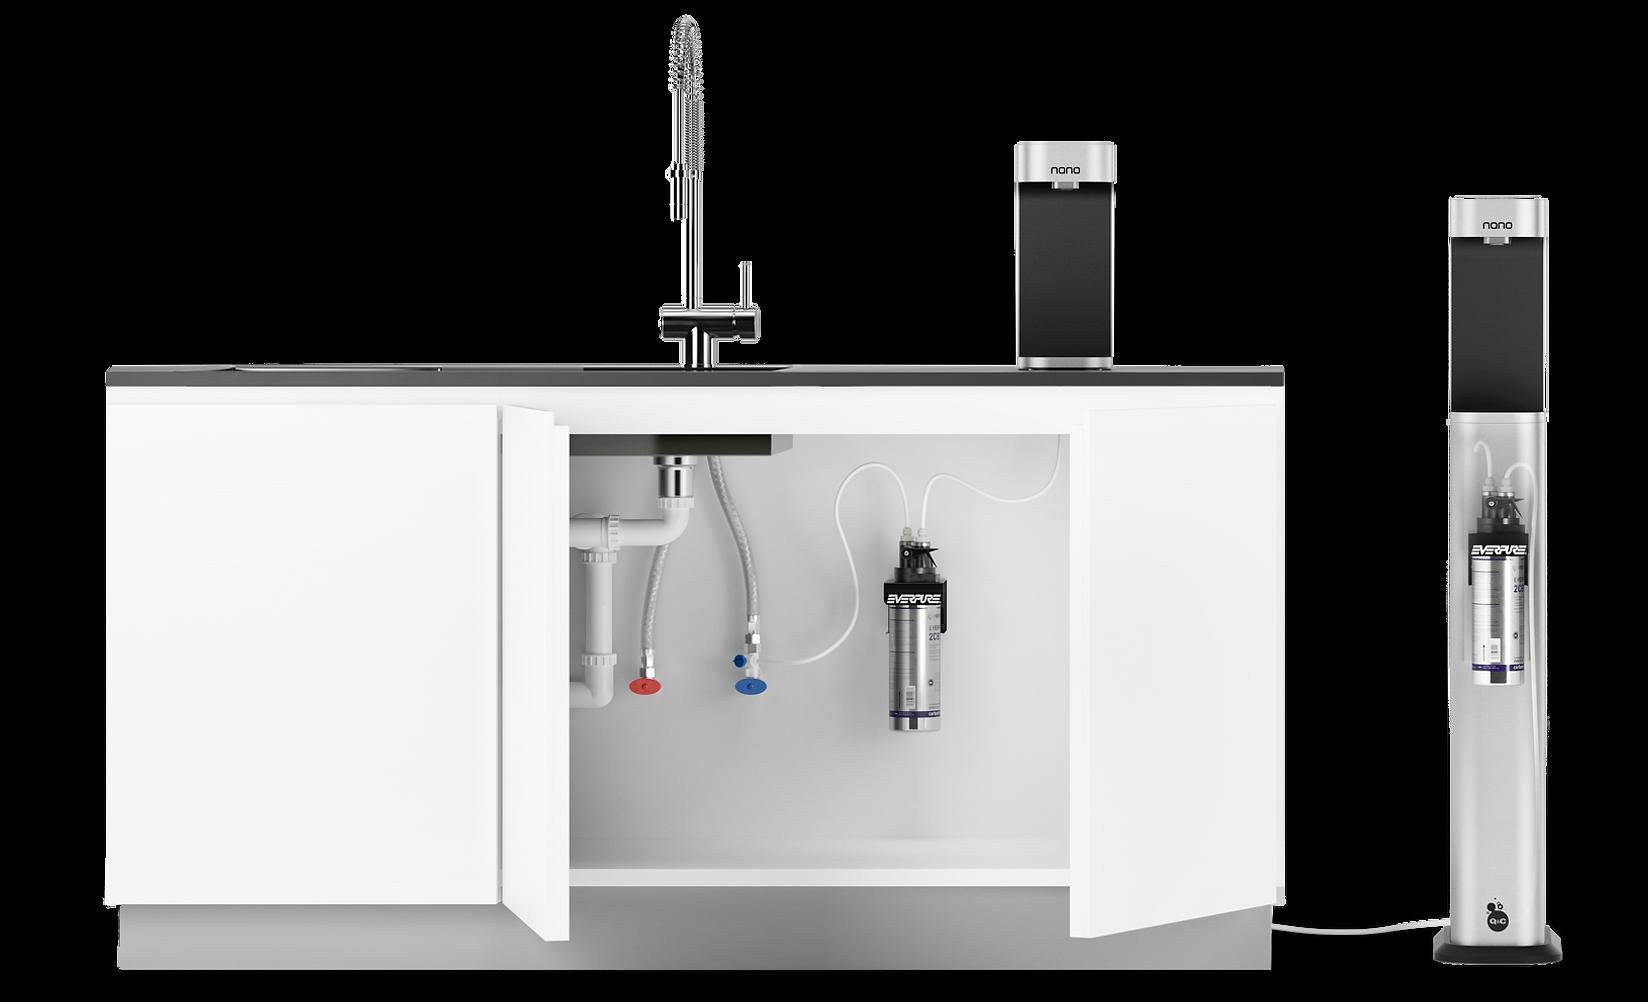 Nano countertop and freestanding